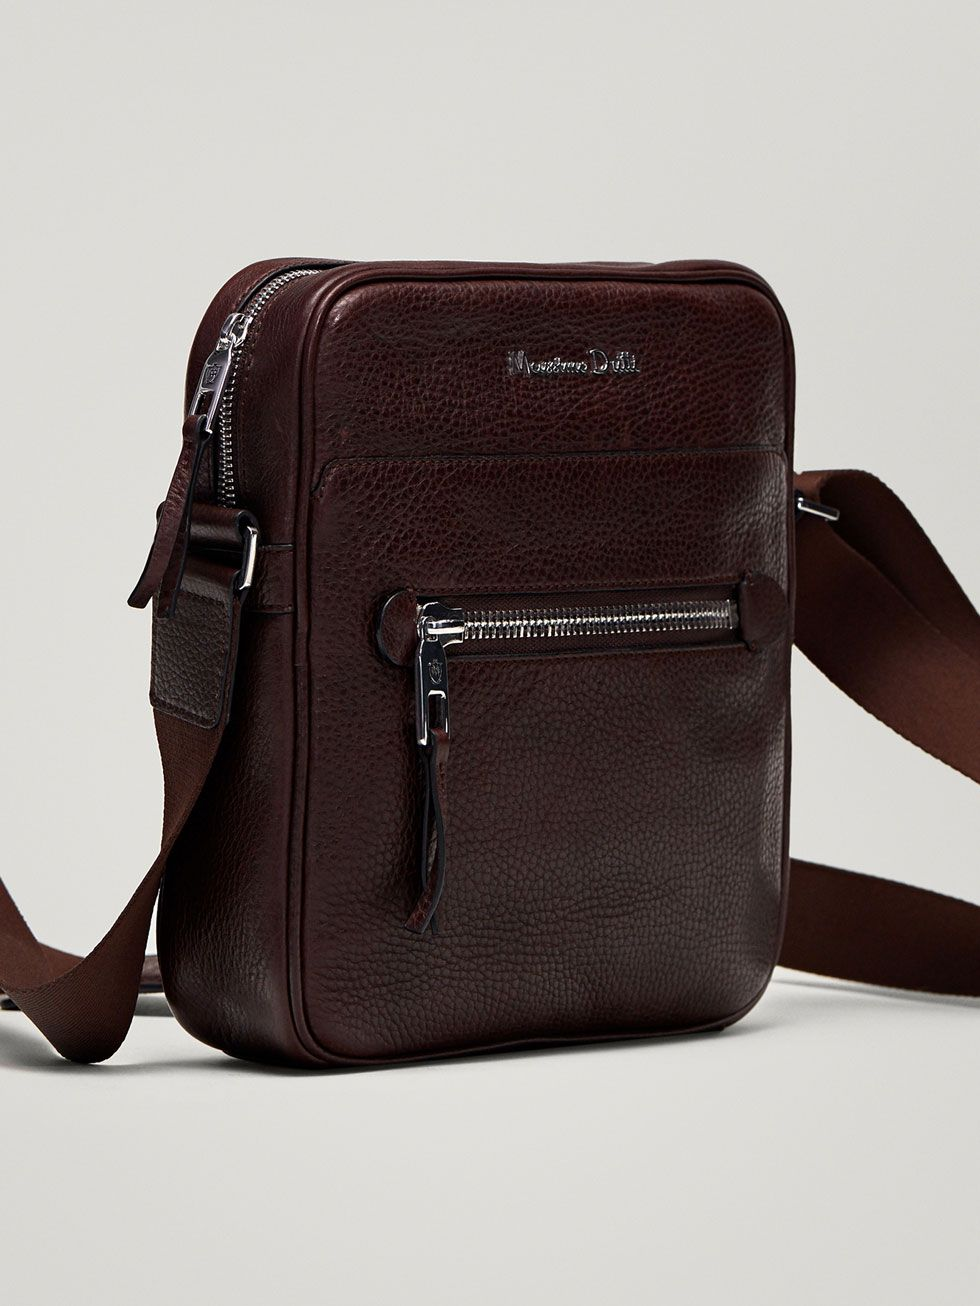 Fall Winter 2017 Men´s EMBOSSED MONTANA LEATHER CROSSBODY BAG at Massimo  Dutti for 129. Effortless elegance! fa2b18f8eaafc